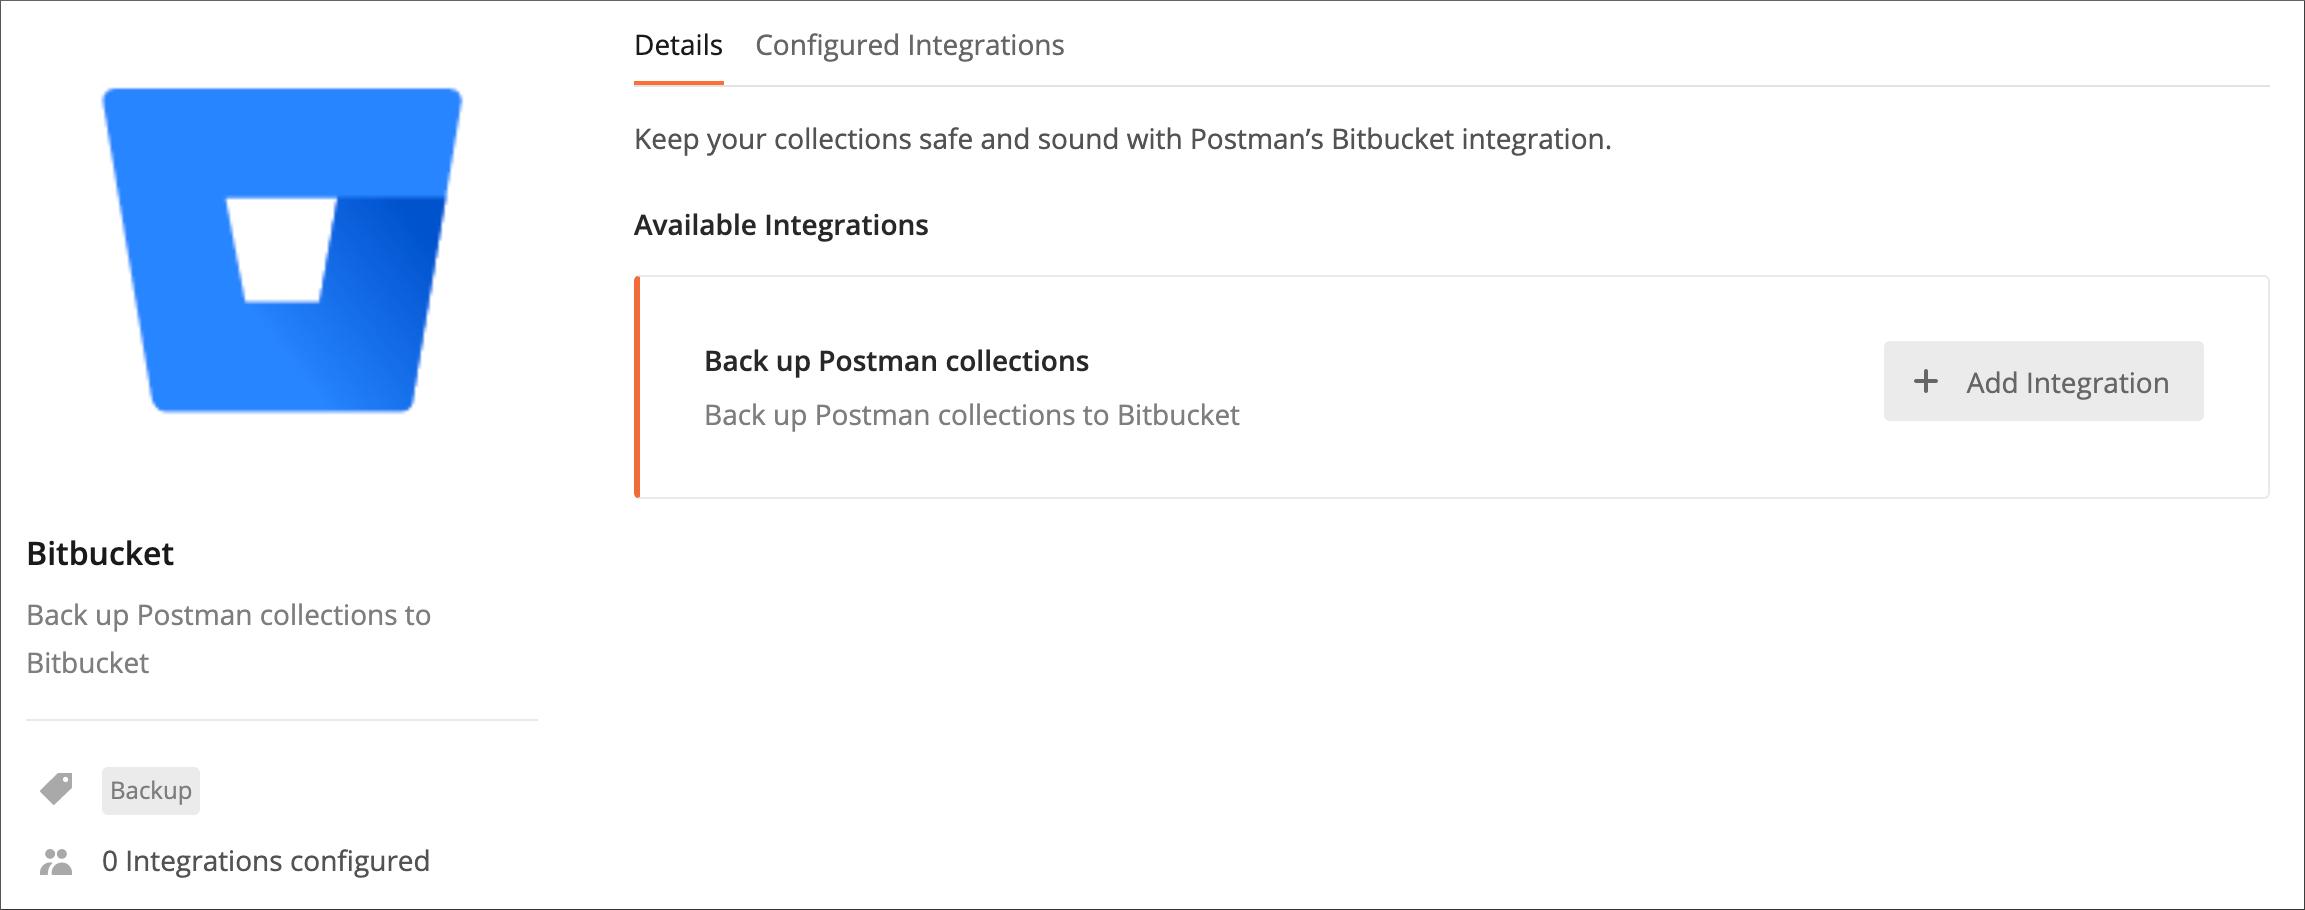 Bitbucket page